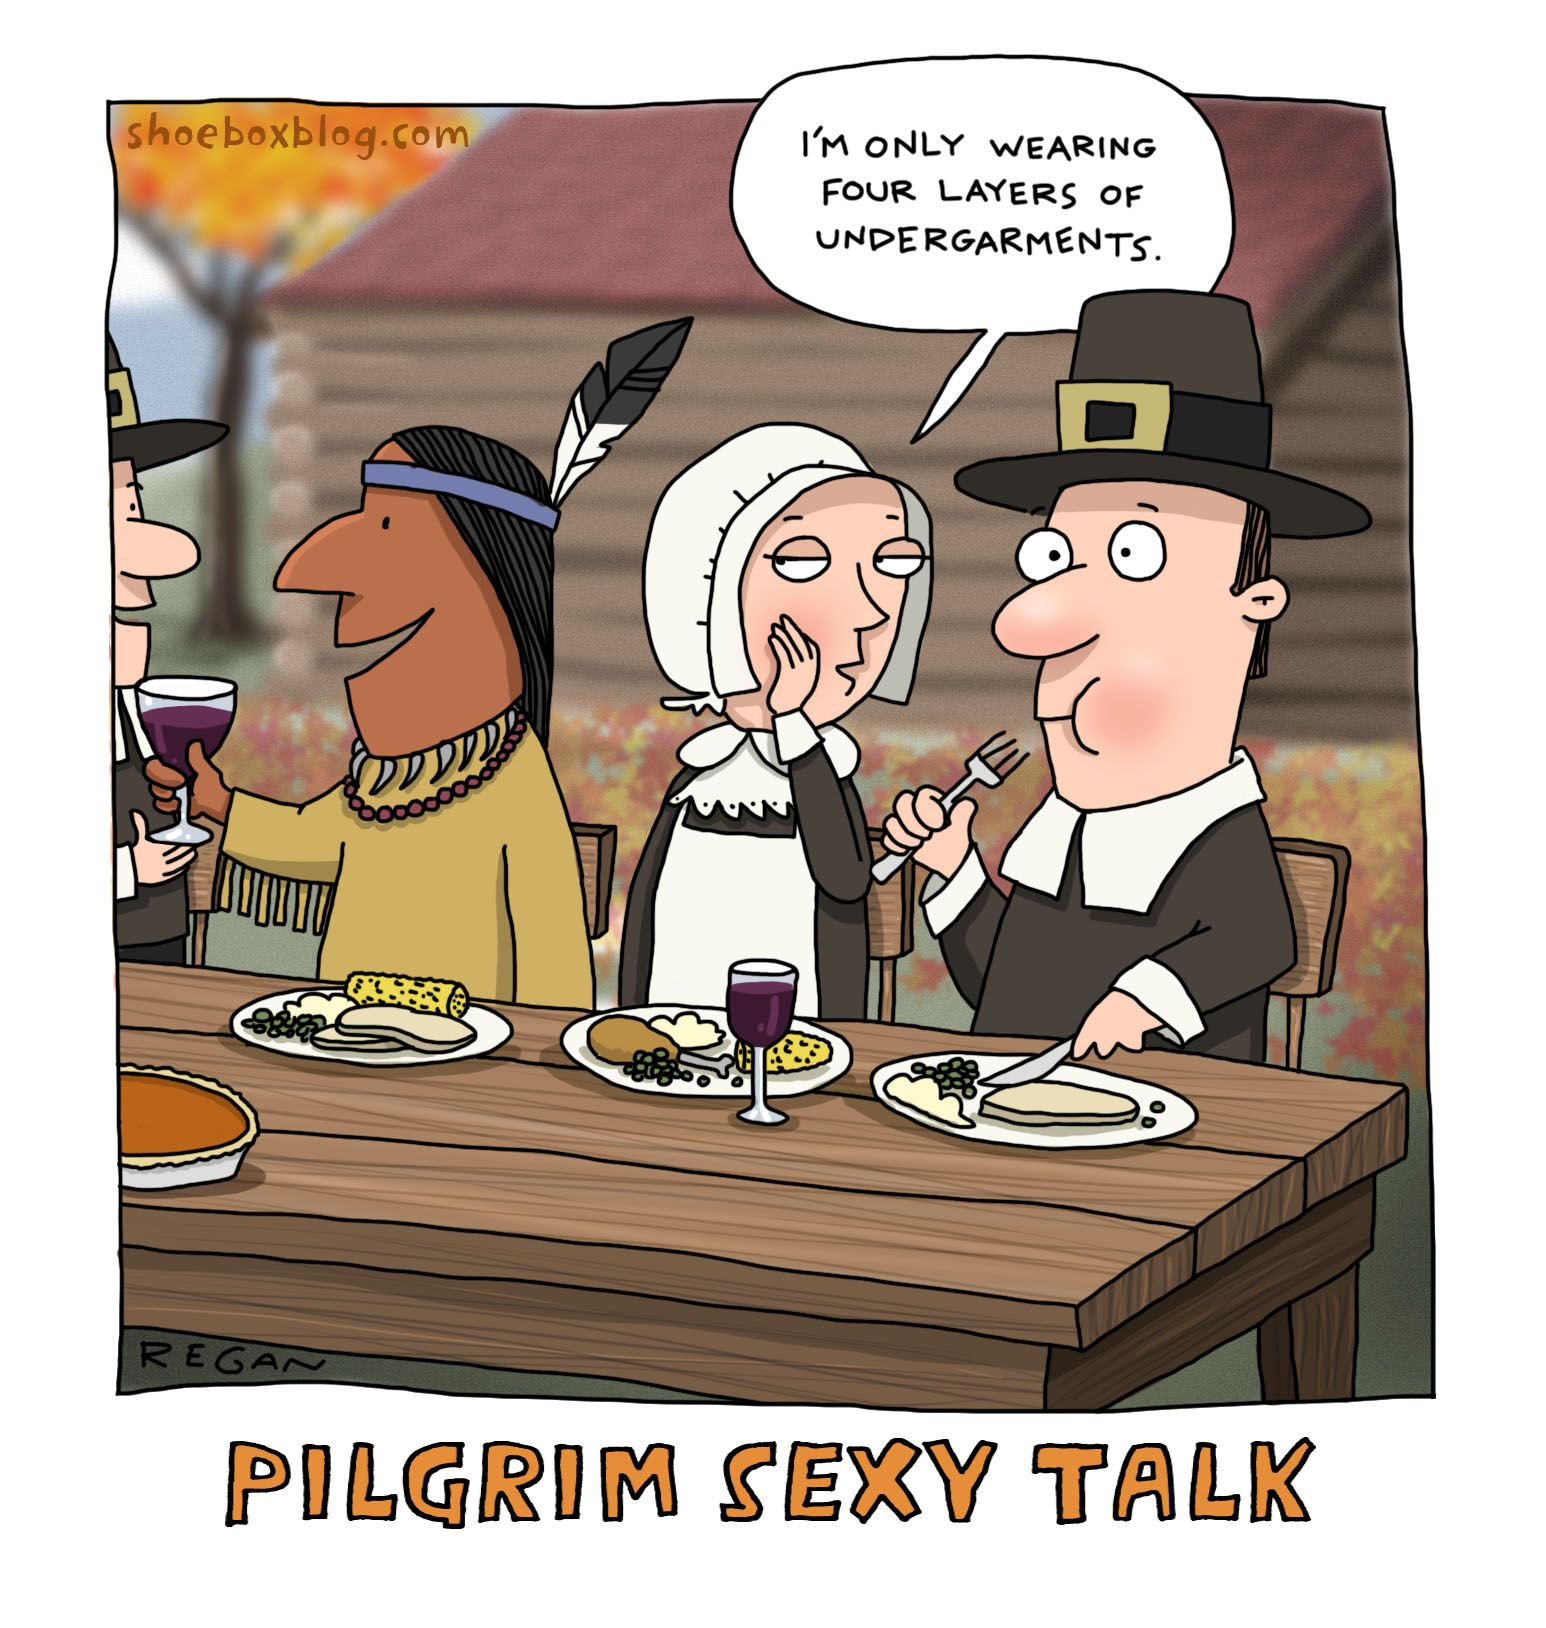 Uncategorized Funny Pilgrim Jokes pilgrim undergarments cool pics pinterest funny com sexy talk is the easiest way to have fun jokes